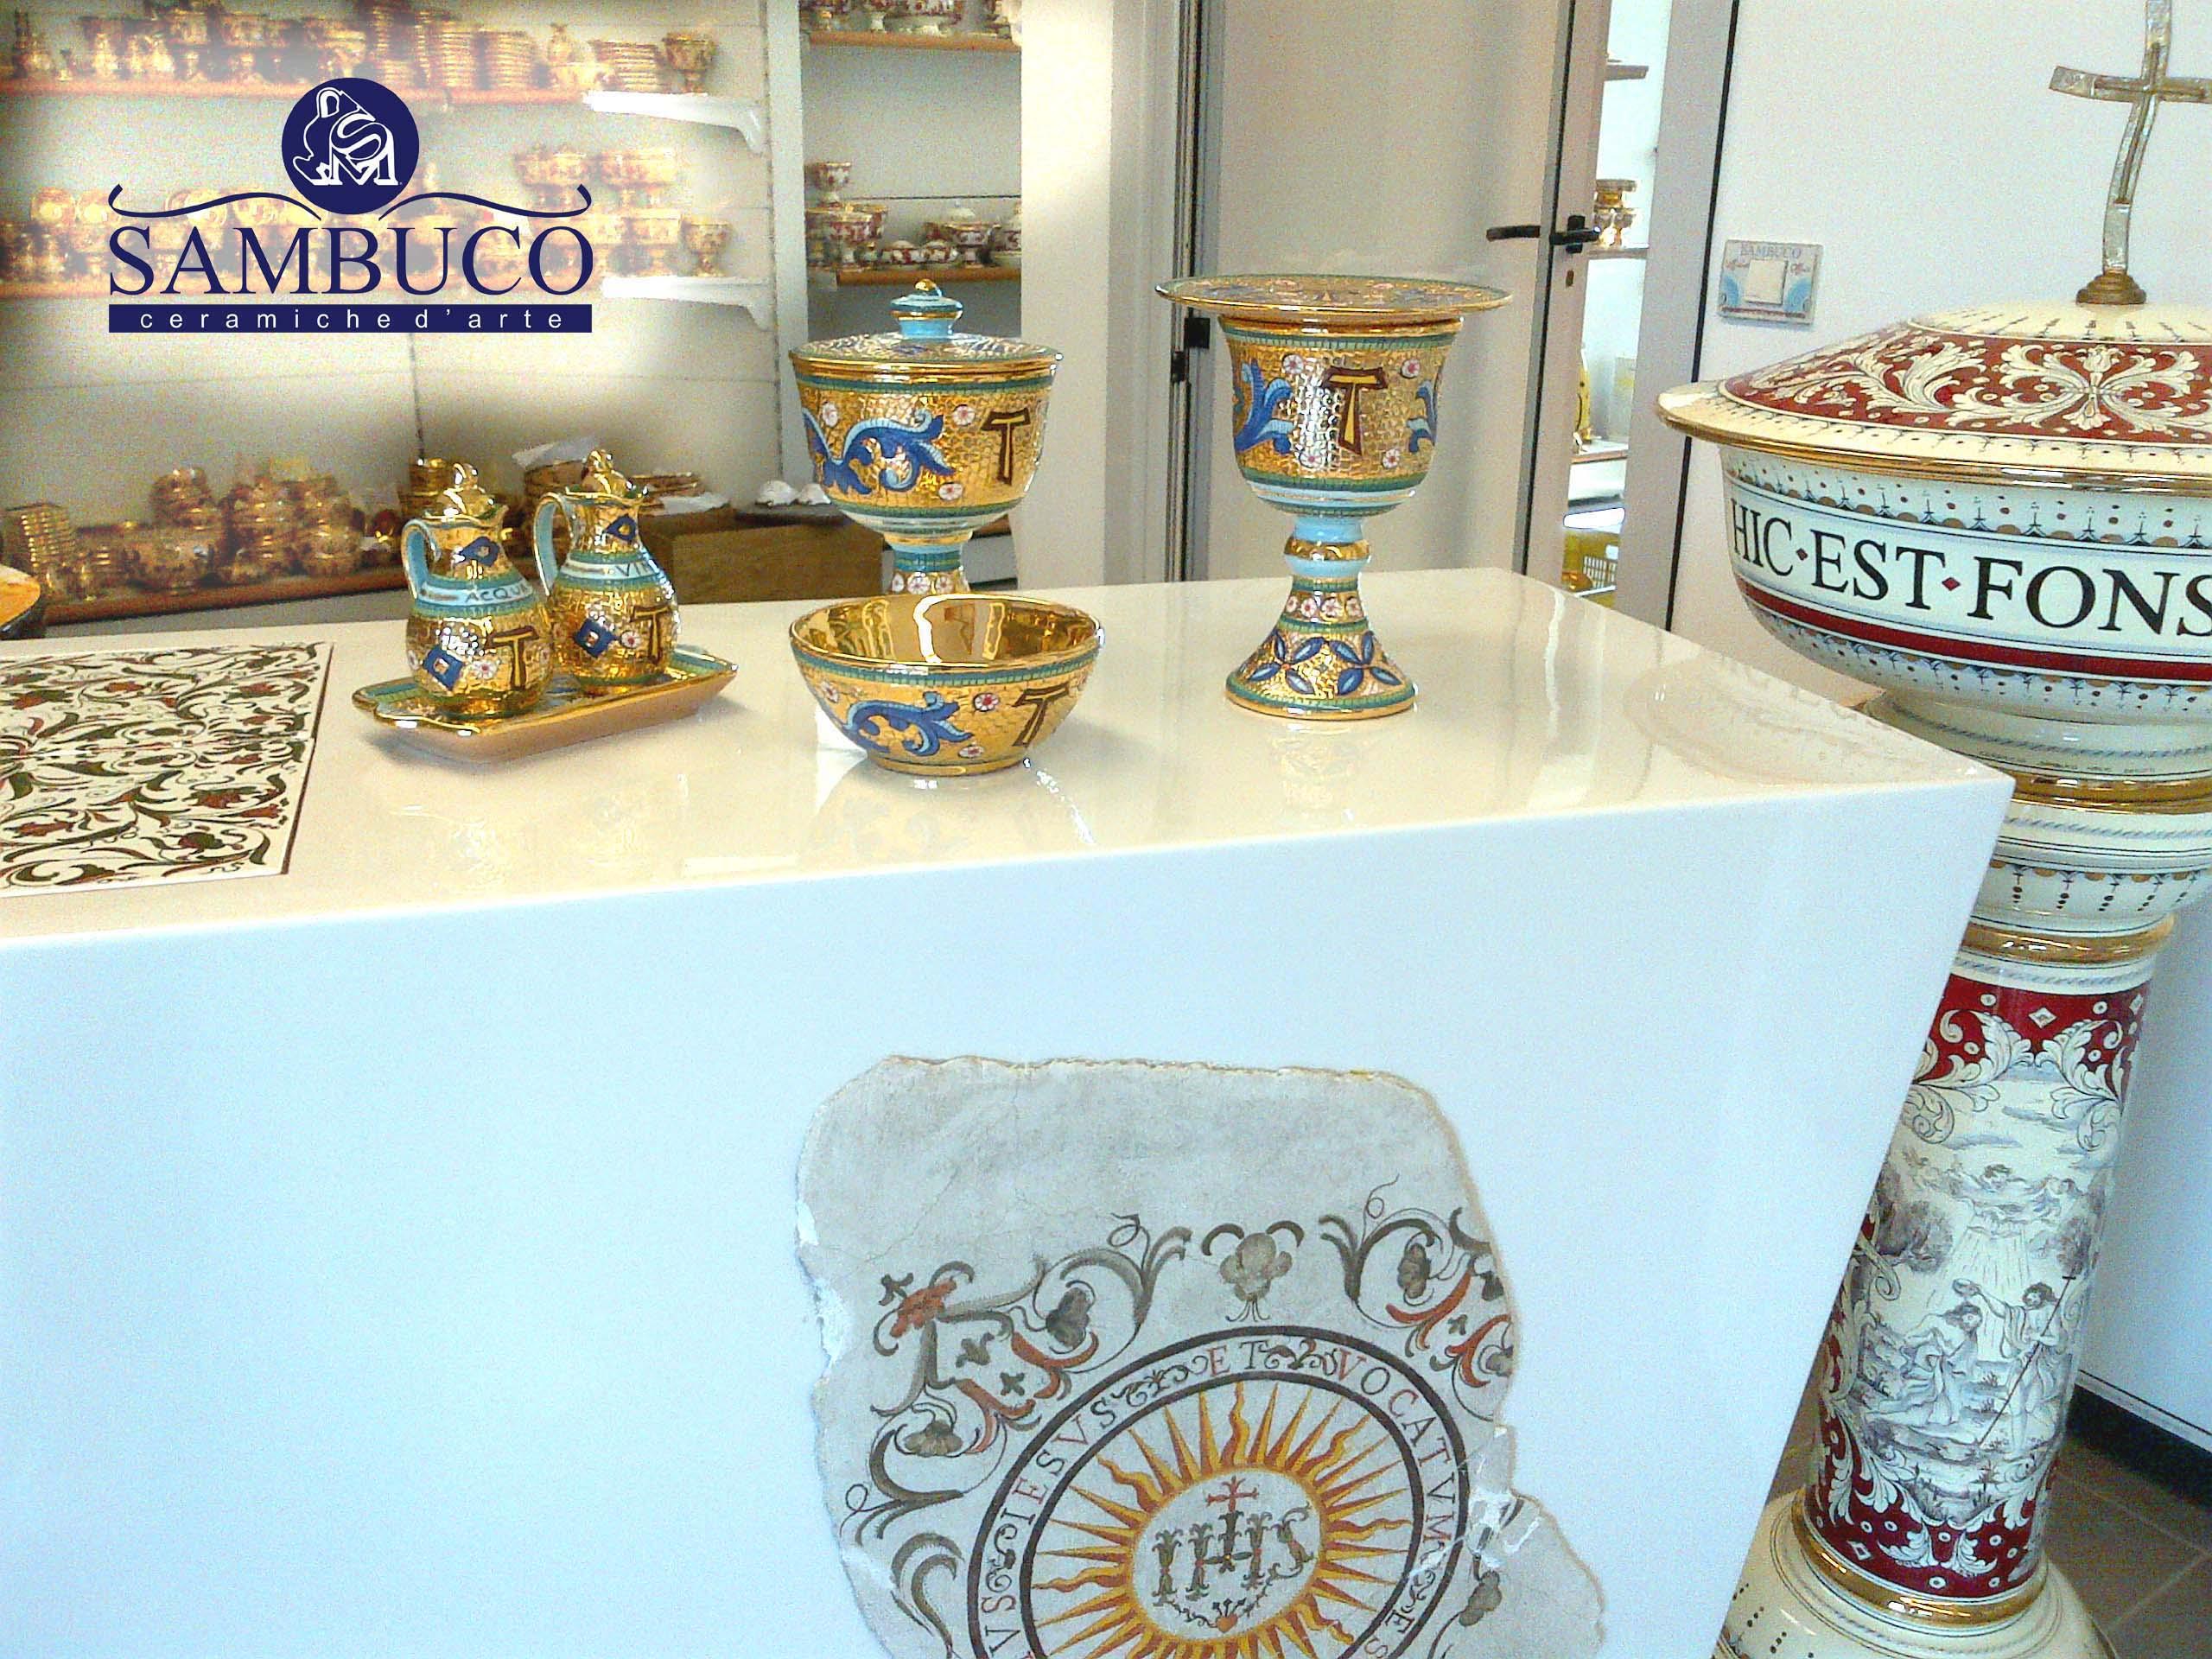 Sambuco Arte Sacra Deruta Esposizione Show-Room